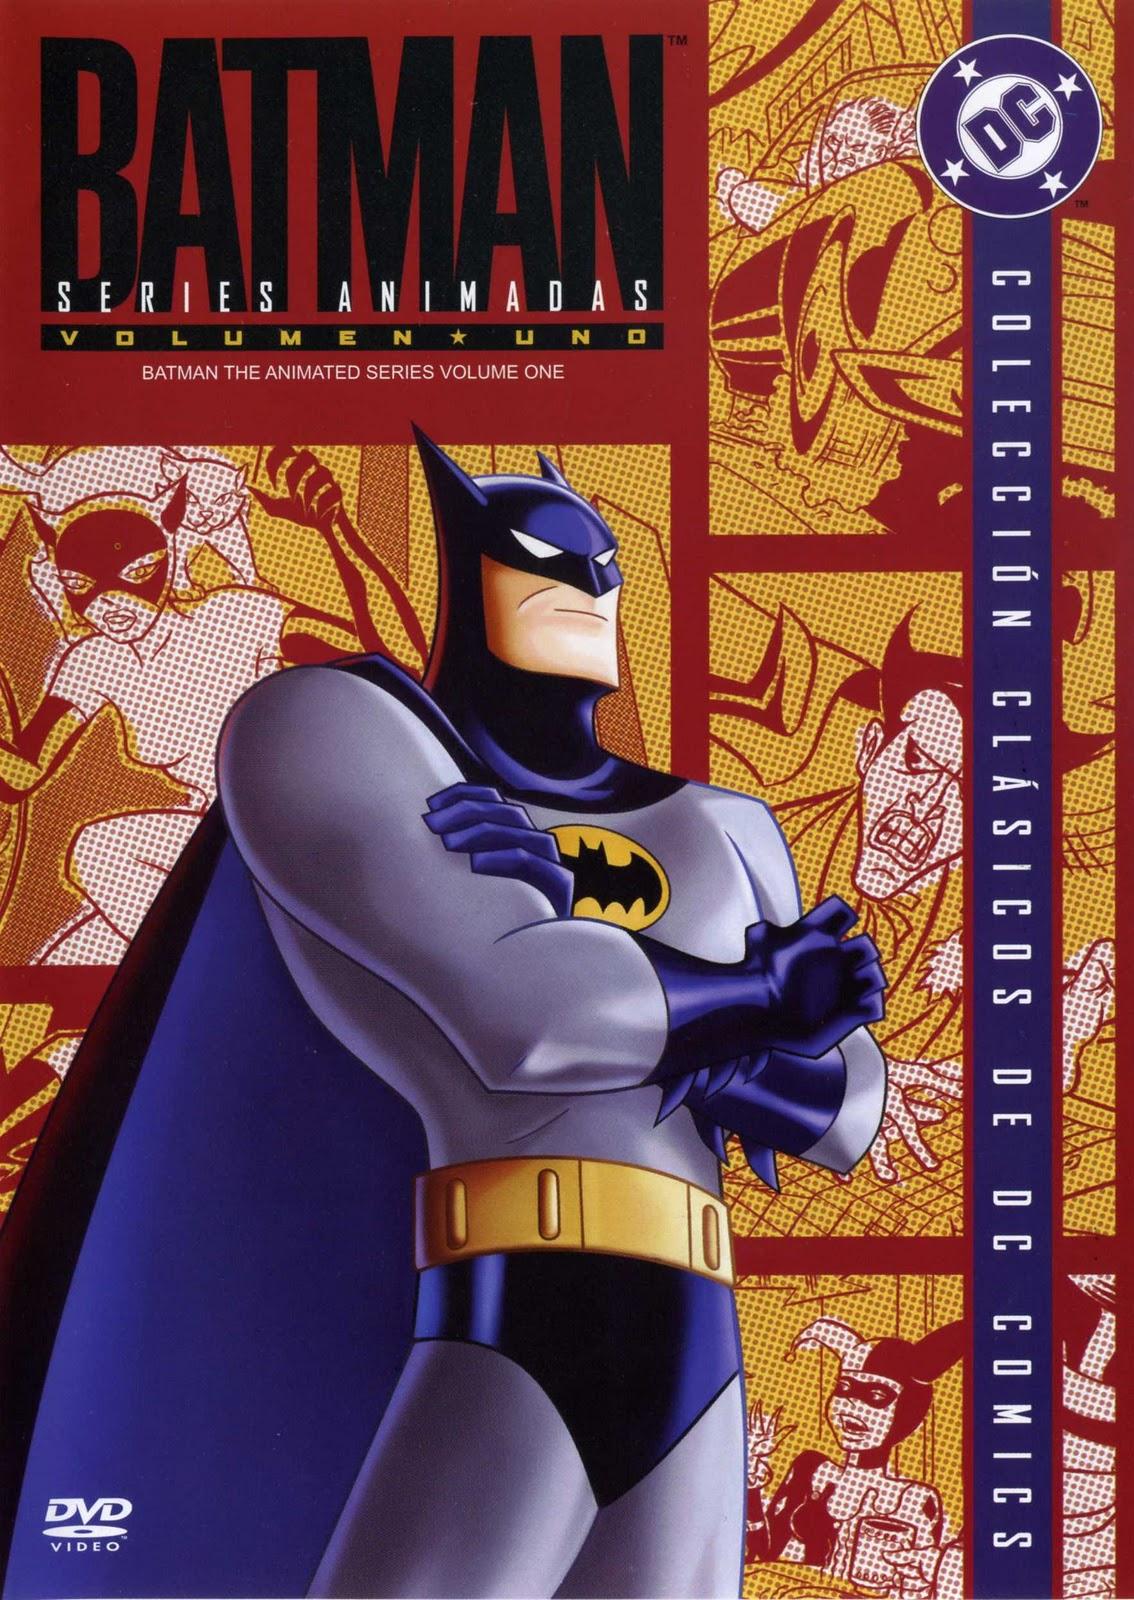 Batman serie animada latino completa online dating 4